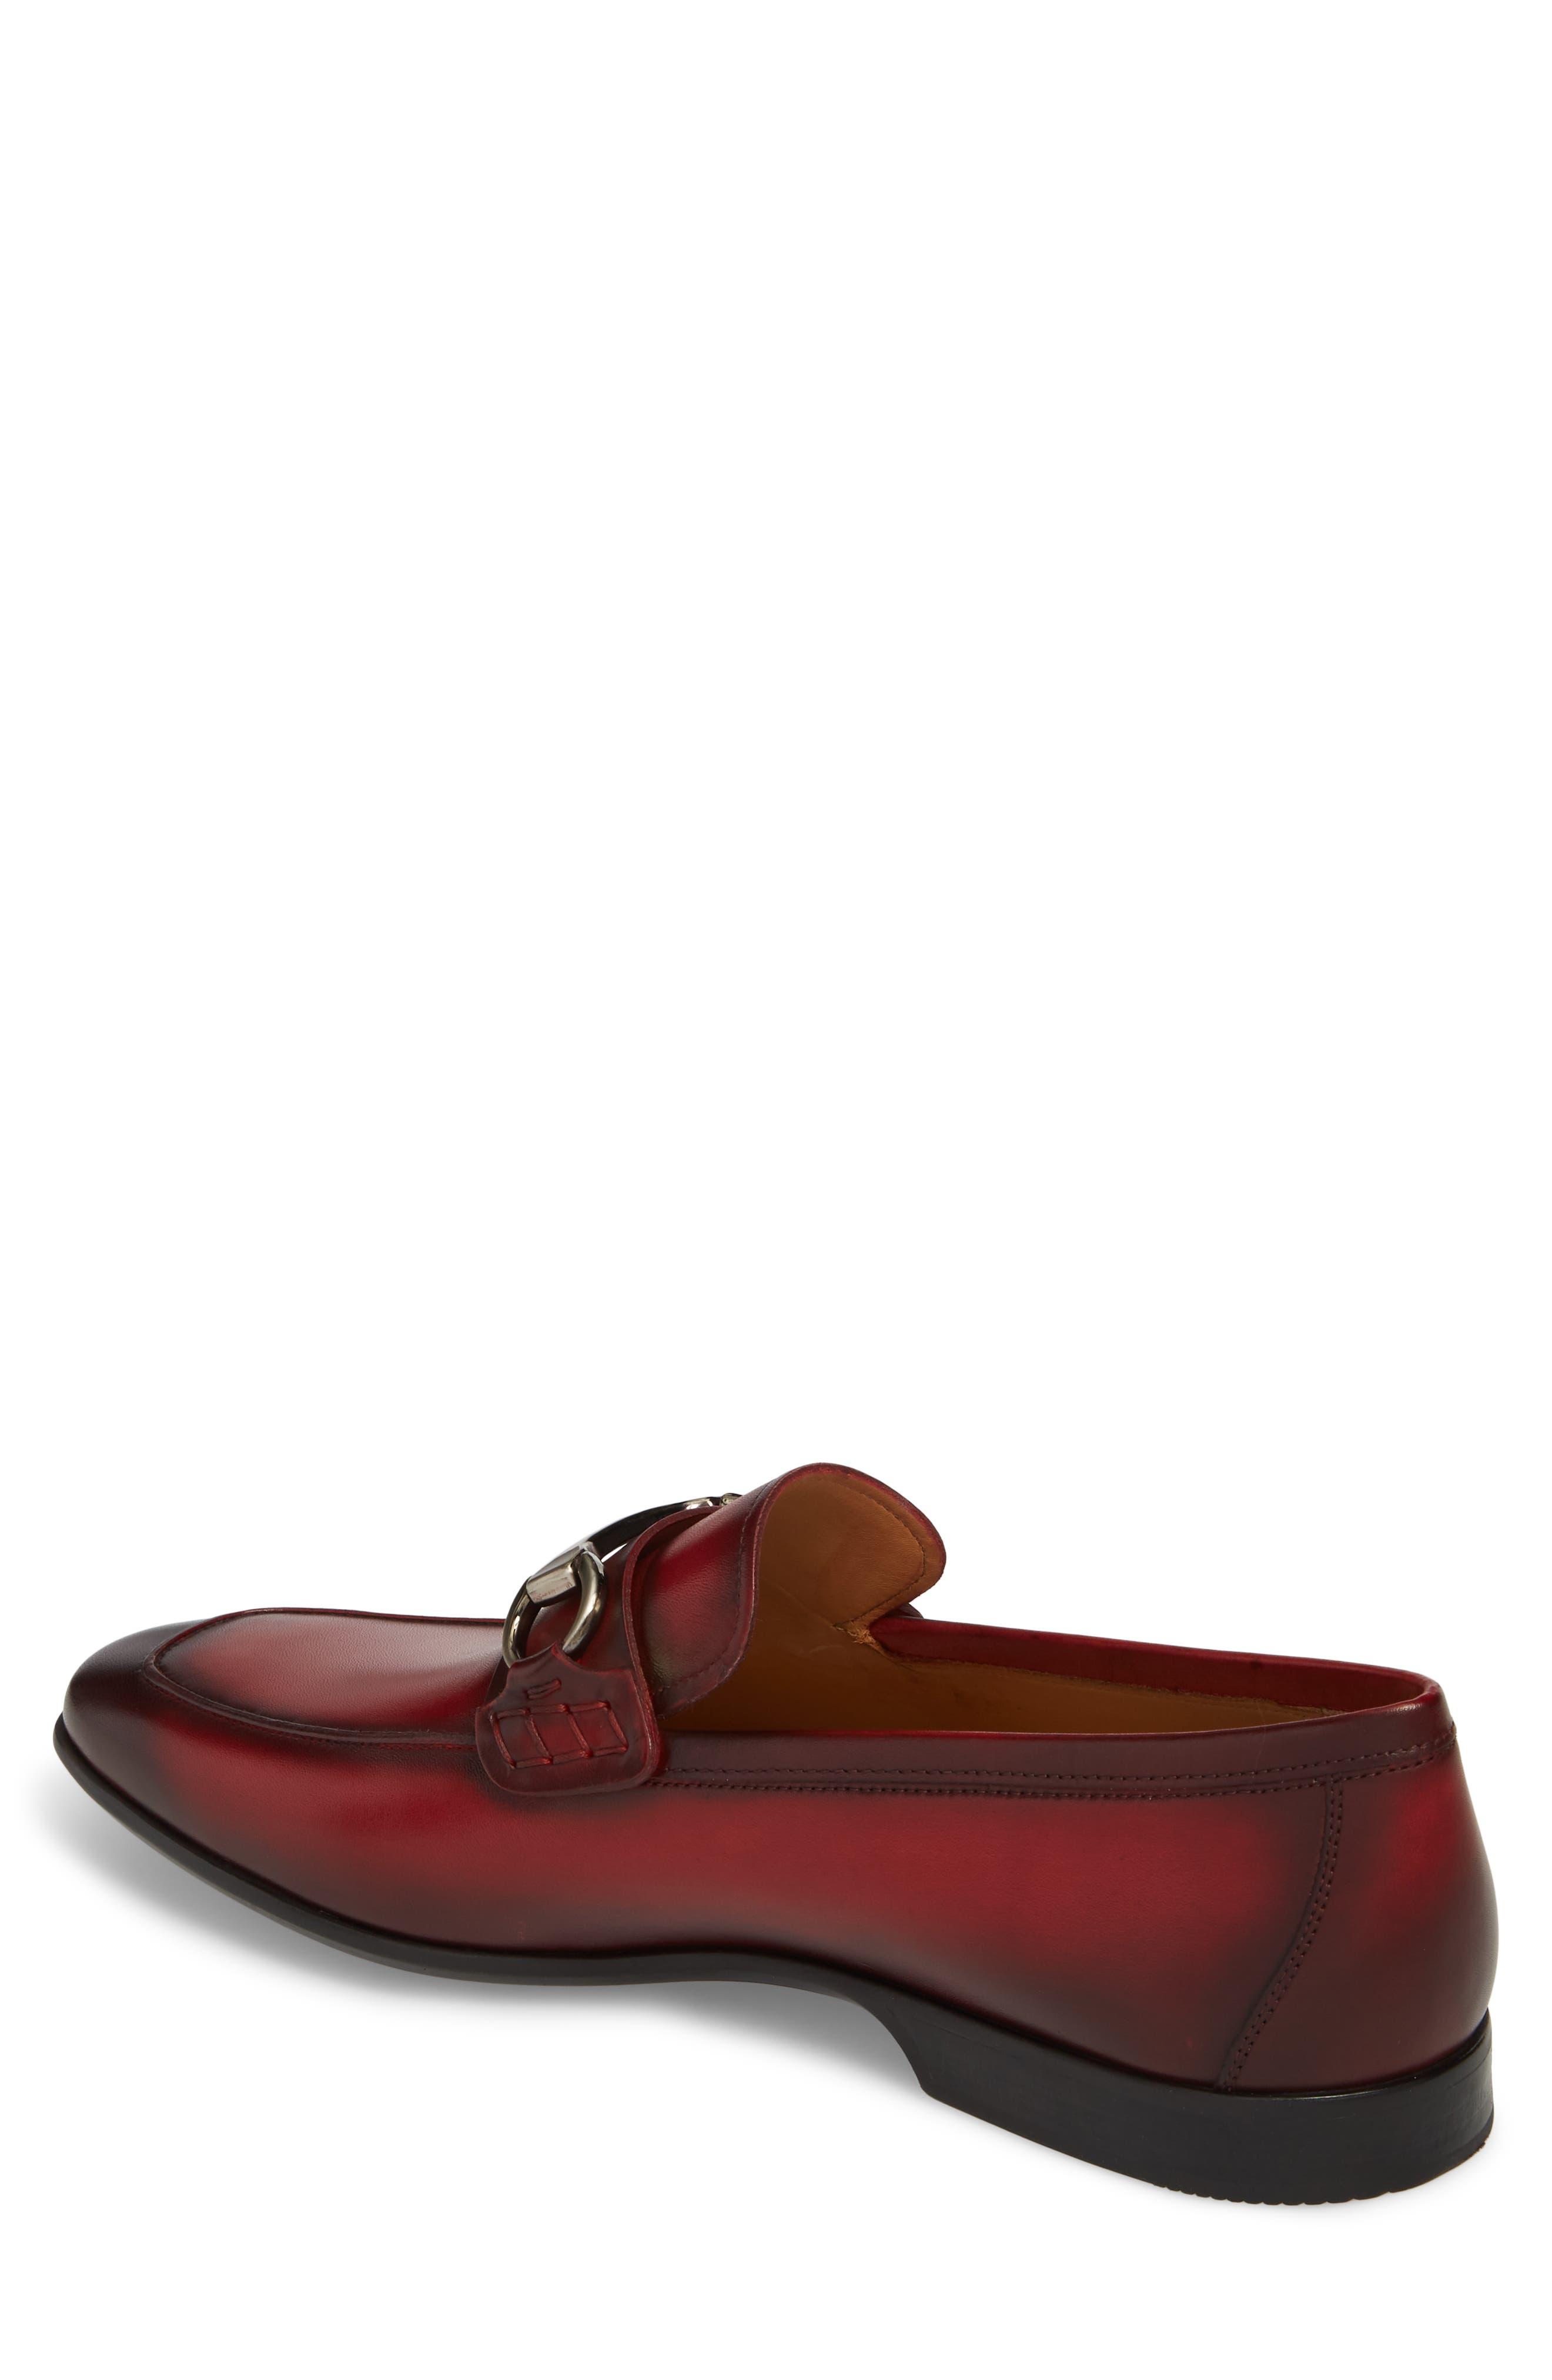 'Rafa II' Bit Loafer,                             Alternate thumbnail 8, color,